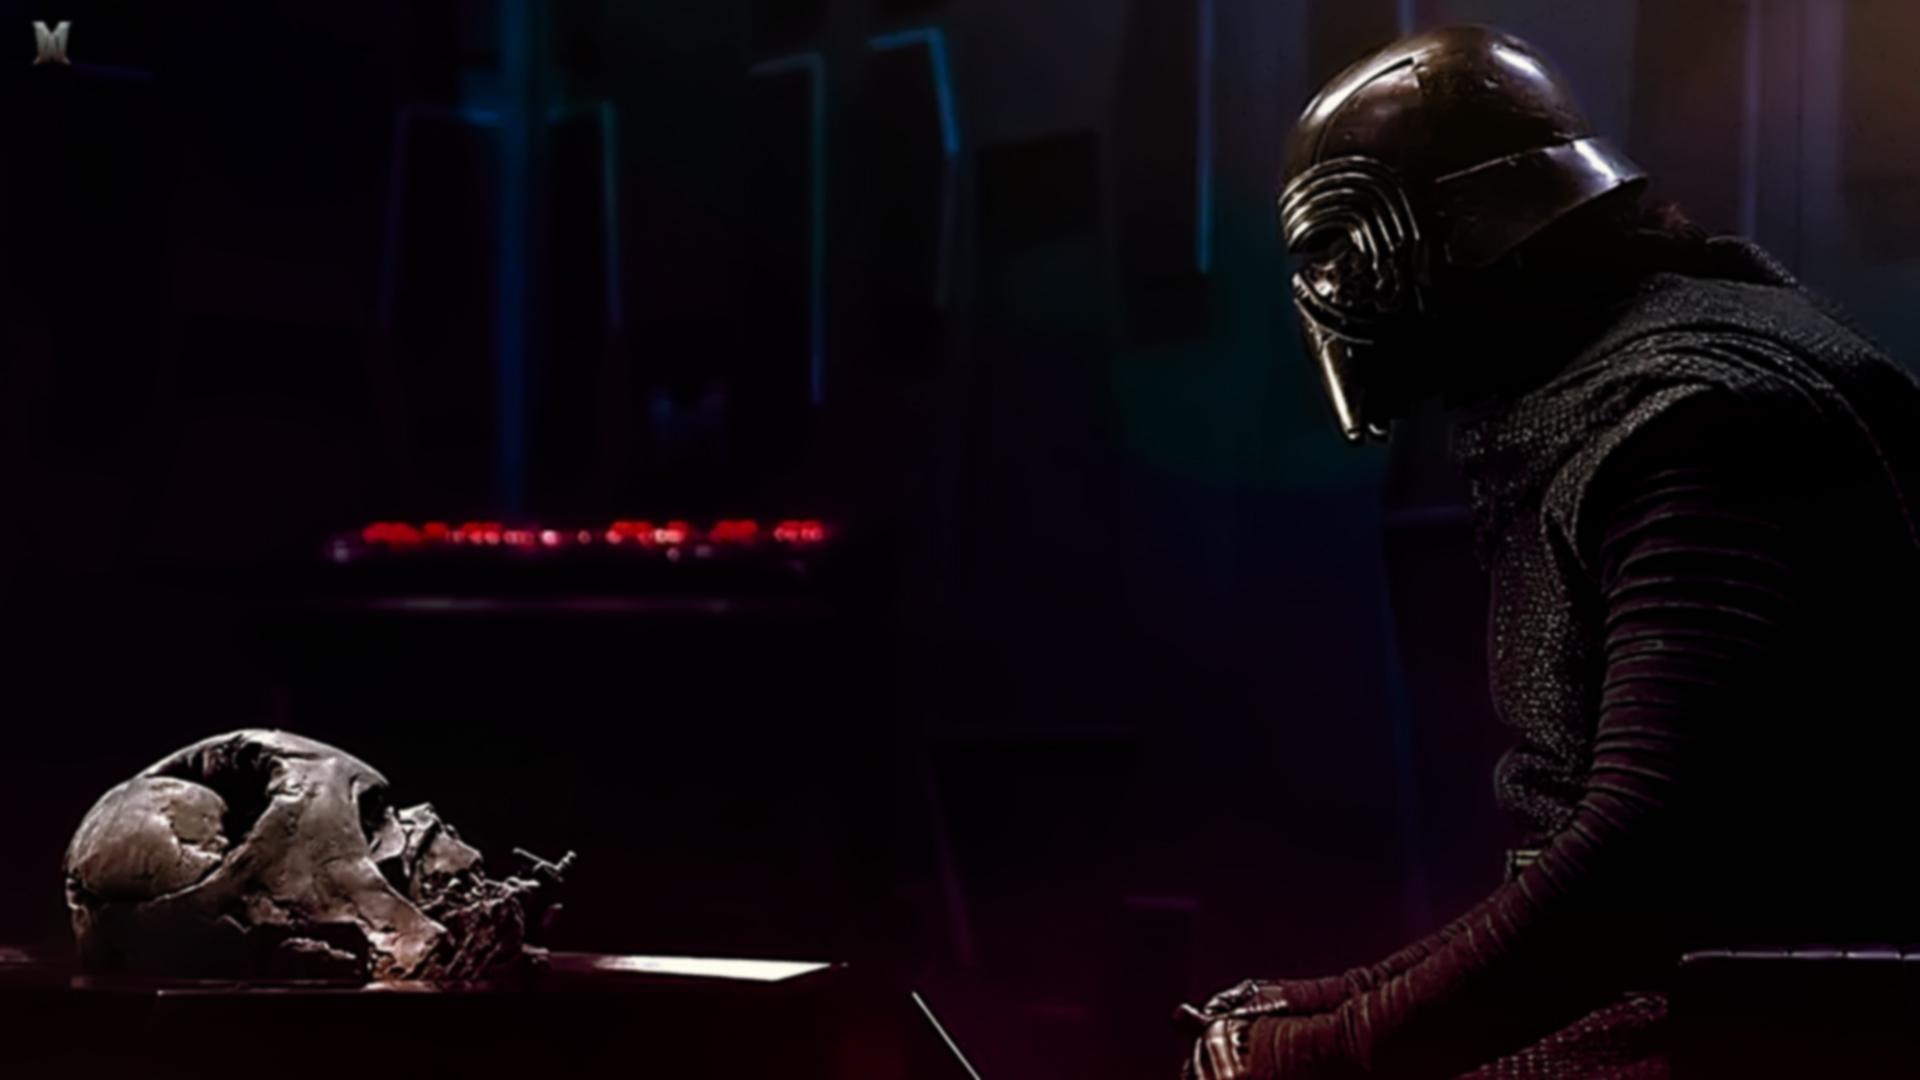 Wallpaper Teach Me The Dark Side Star Wars Ep7 By Tobimoyd On